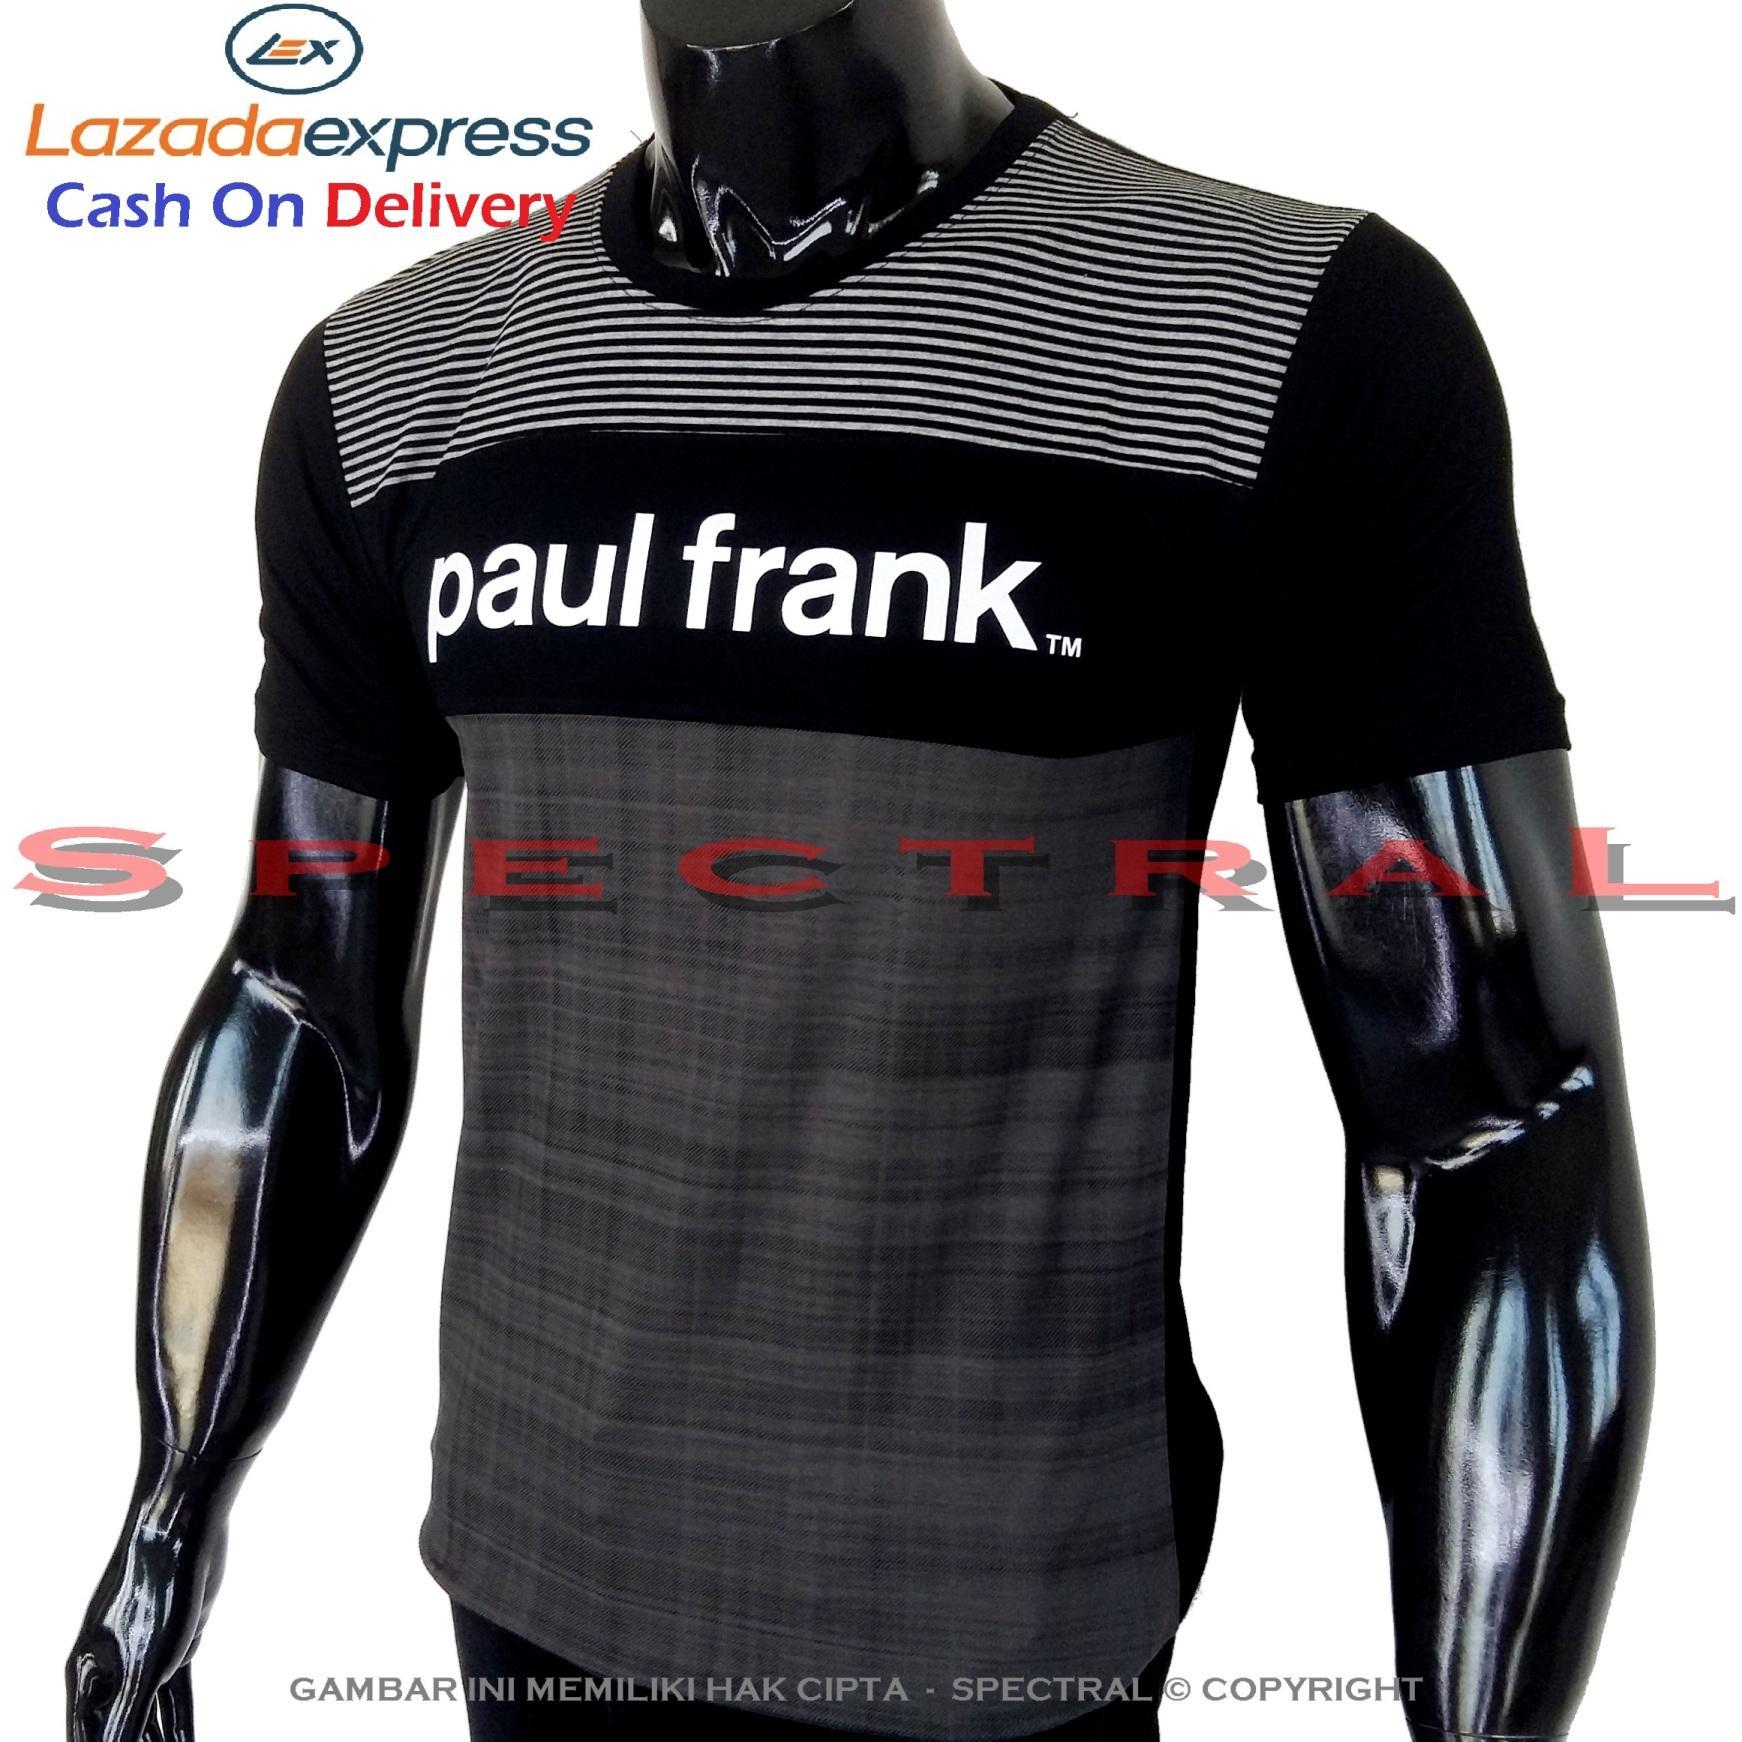 Spectral - Kaos Distro PAUL FRANK Soft Rayon Viscose Lycra Pola M Fit To L Simple Fashionable Tidak